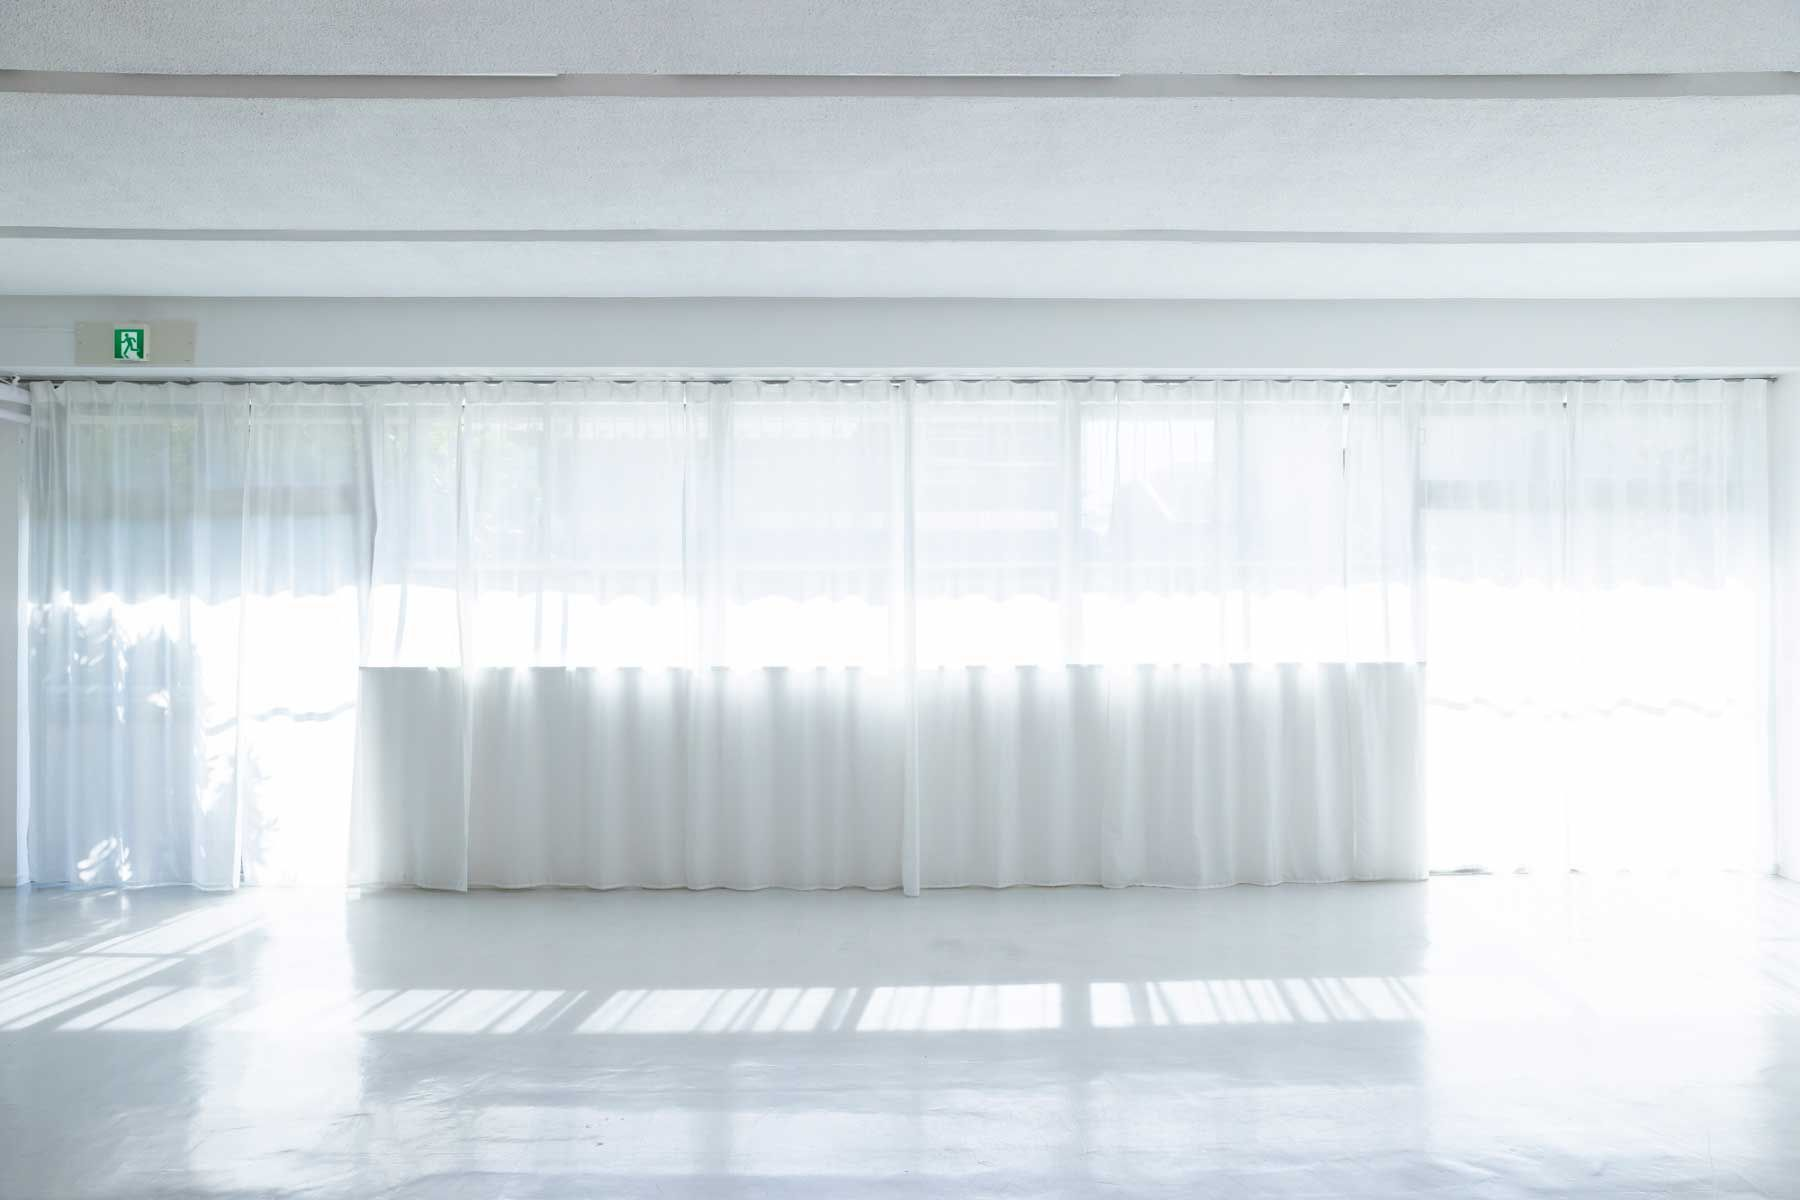 STUDIO NONAMES MEJIRO (スタジオ ノナメス メジロ)南向きの大きな窓